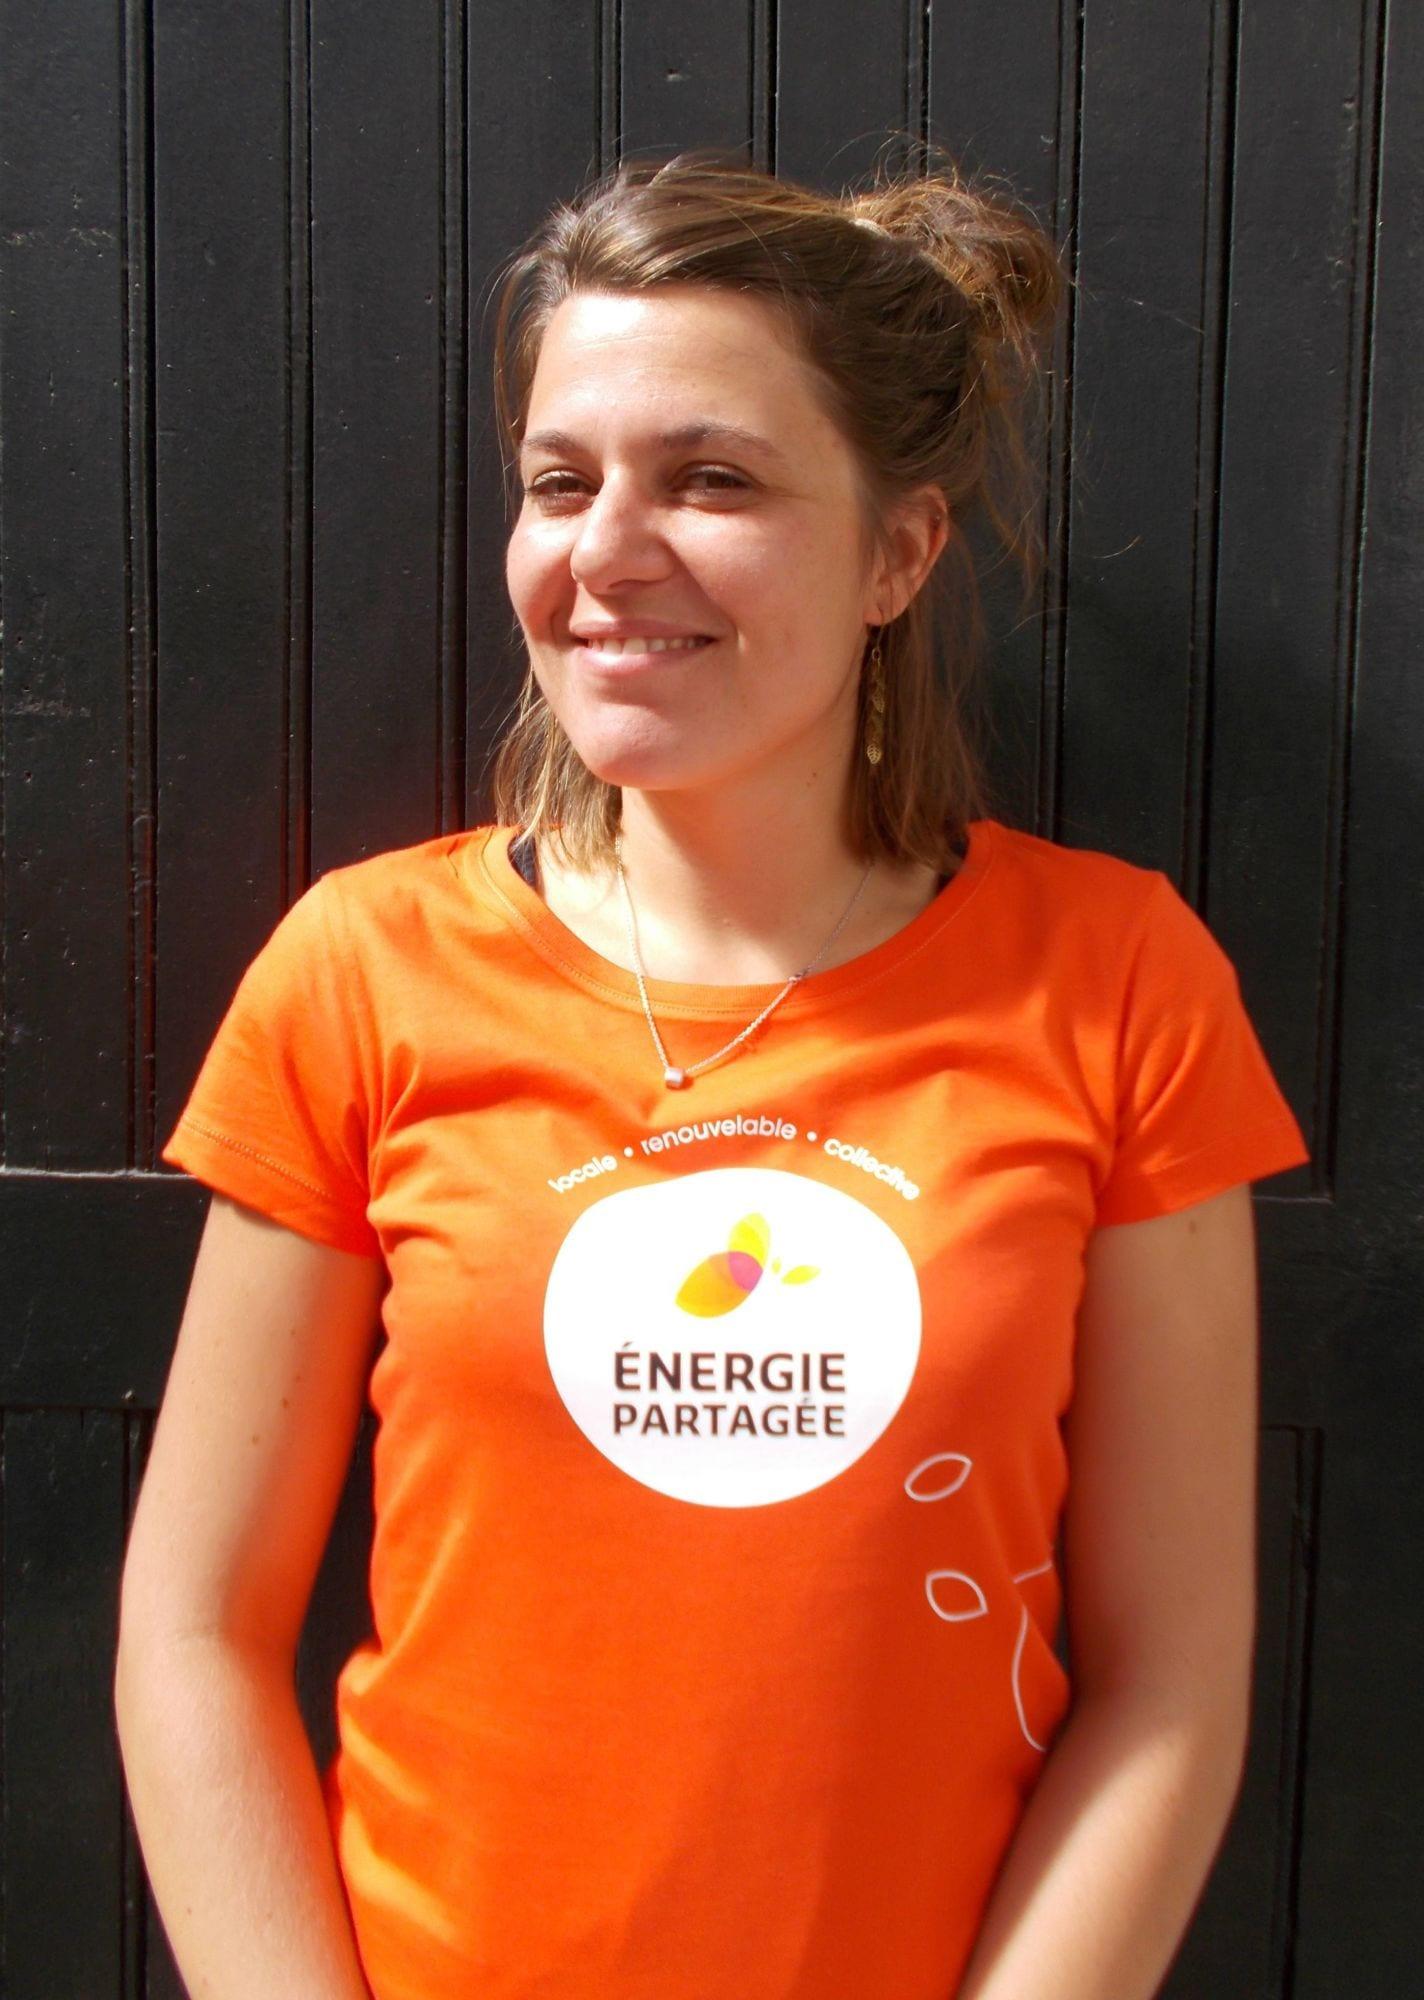 Justine_Energie Partagee